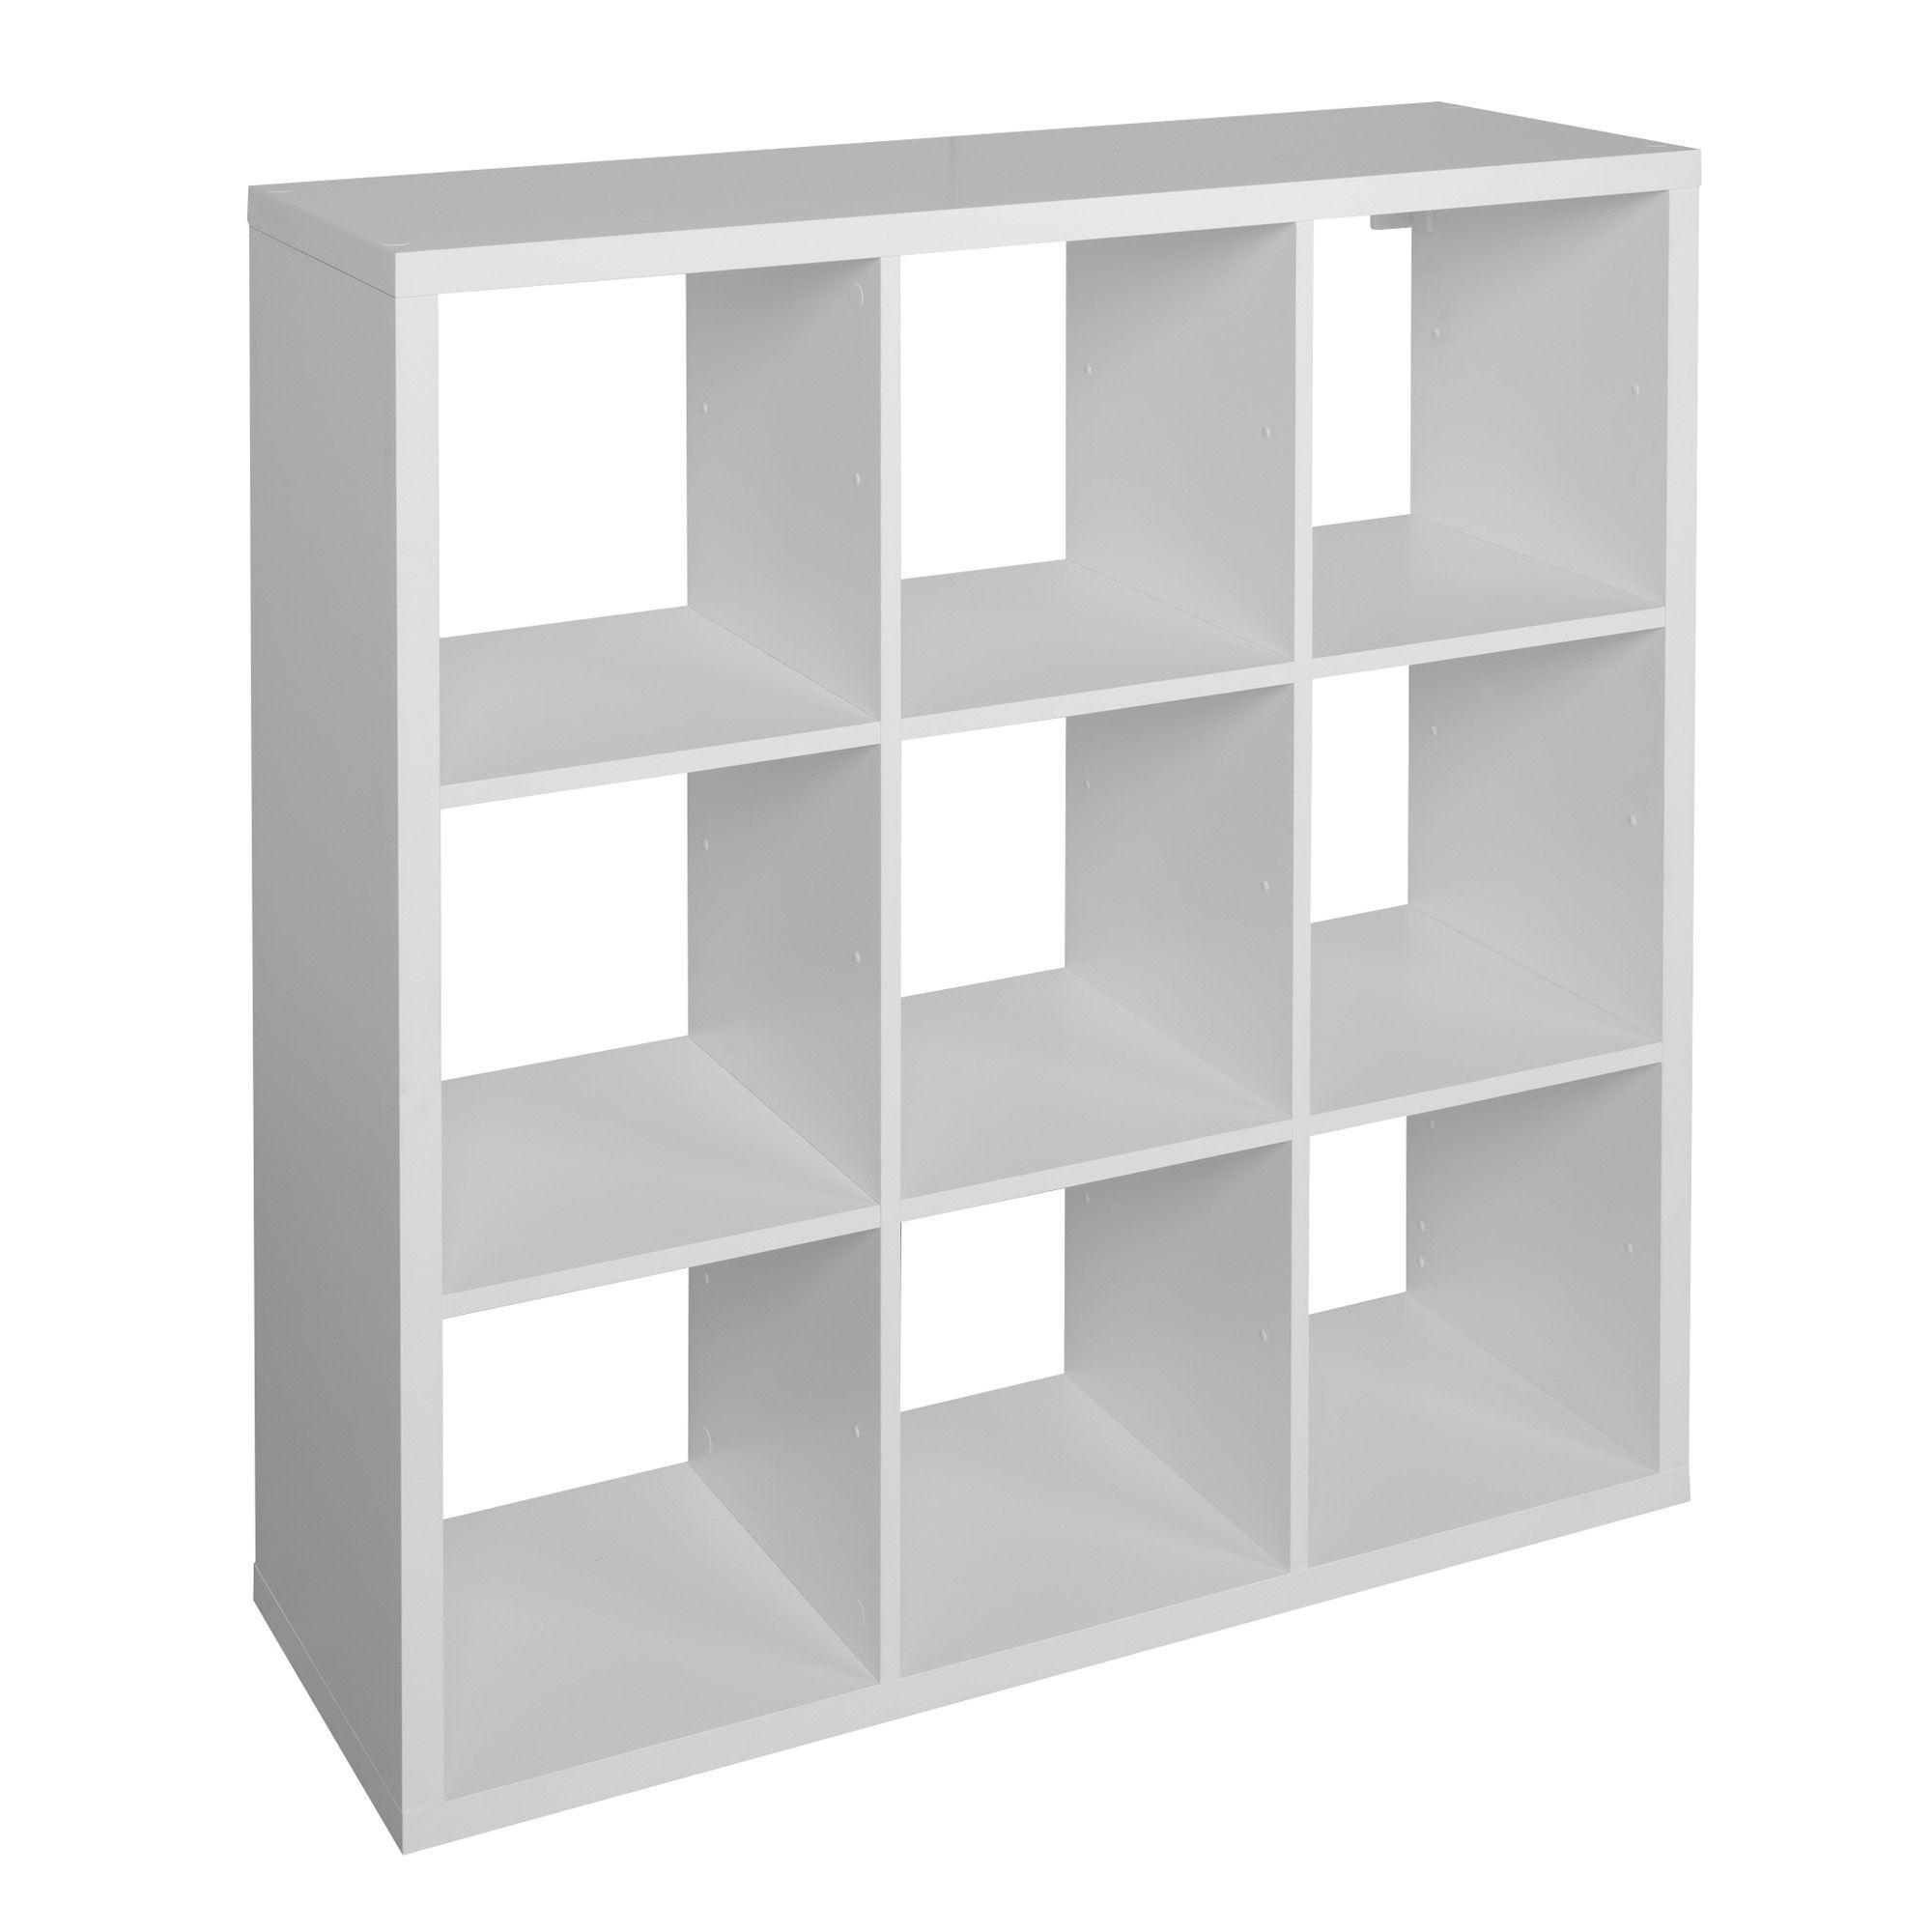 diy at b q rh diy com Target Storage Cube Shelves IKEA Storage Cubes